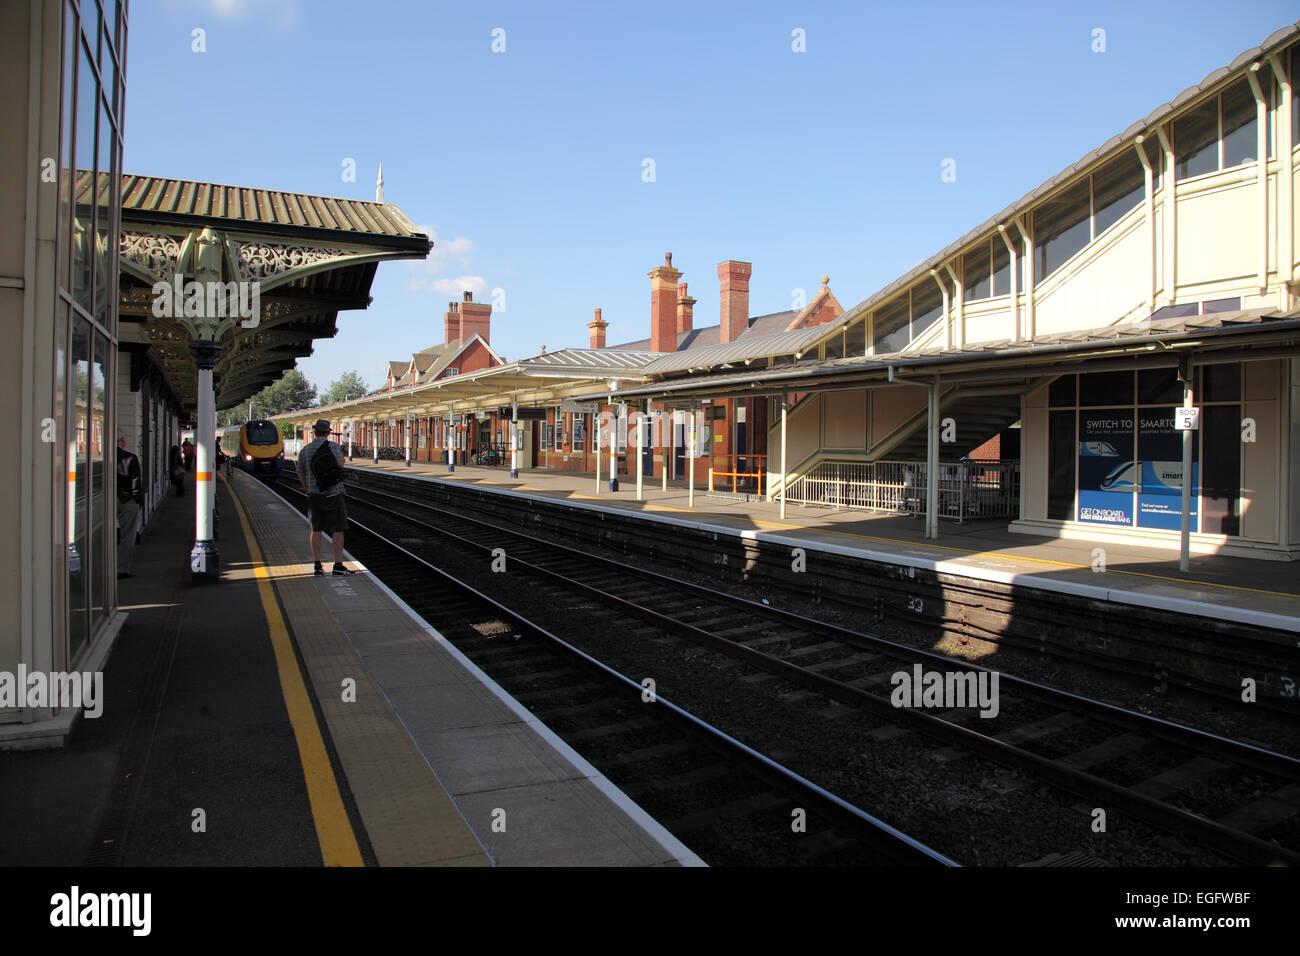 Kettering railway station - Stock Image